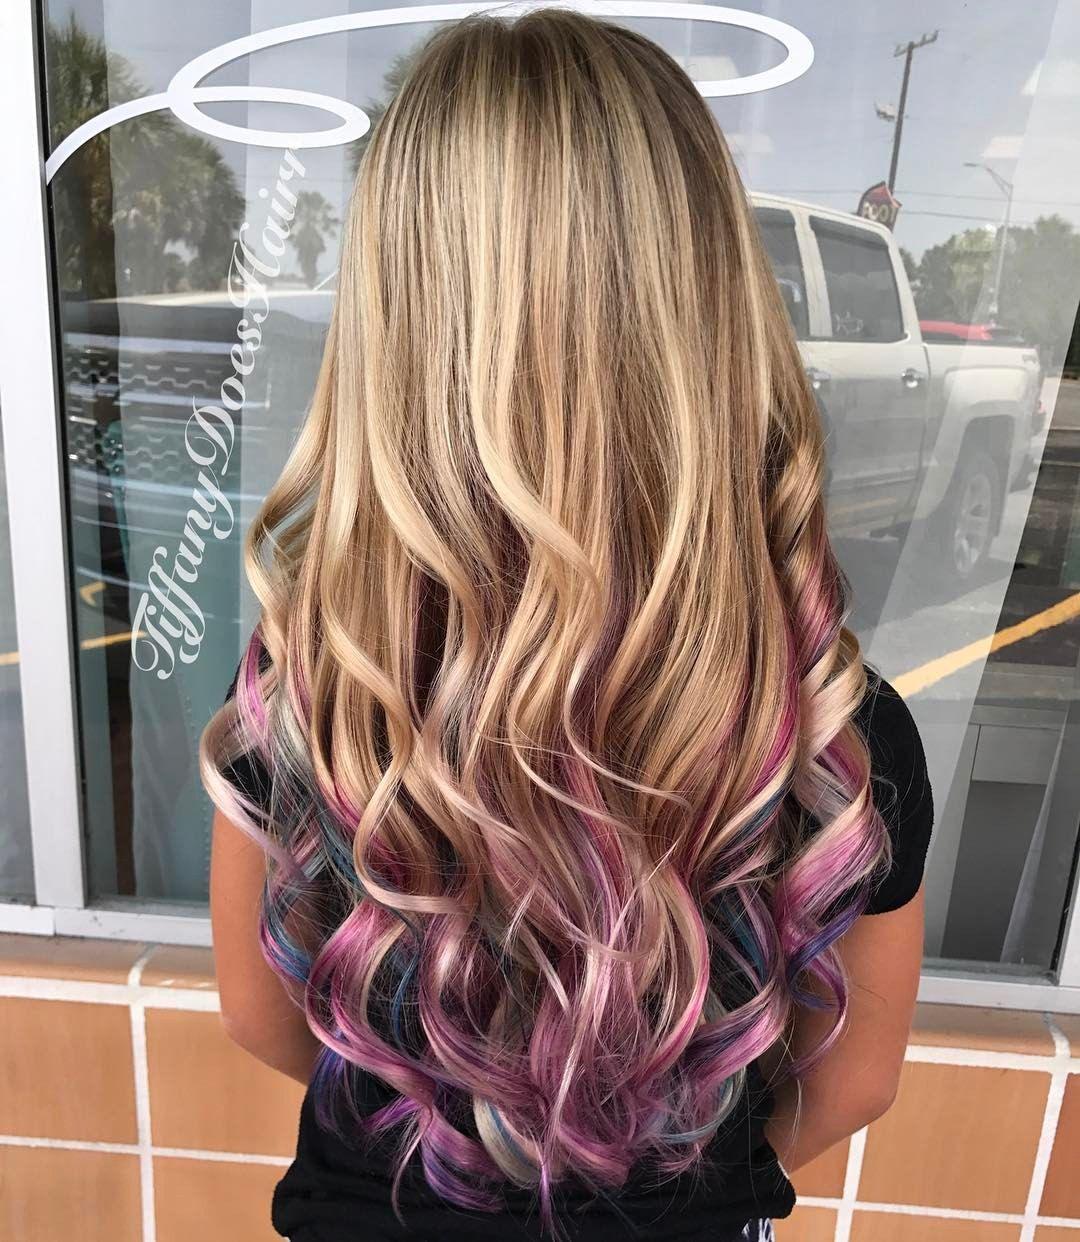 Blonde Pastel Pink Purple And Blue Peekaboo Highlights 13 Likes 1 Comments Tiffany Allen Tiffanydoe Kids Hair Color Peekaboo Hair Purple Hair Highlights